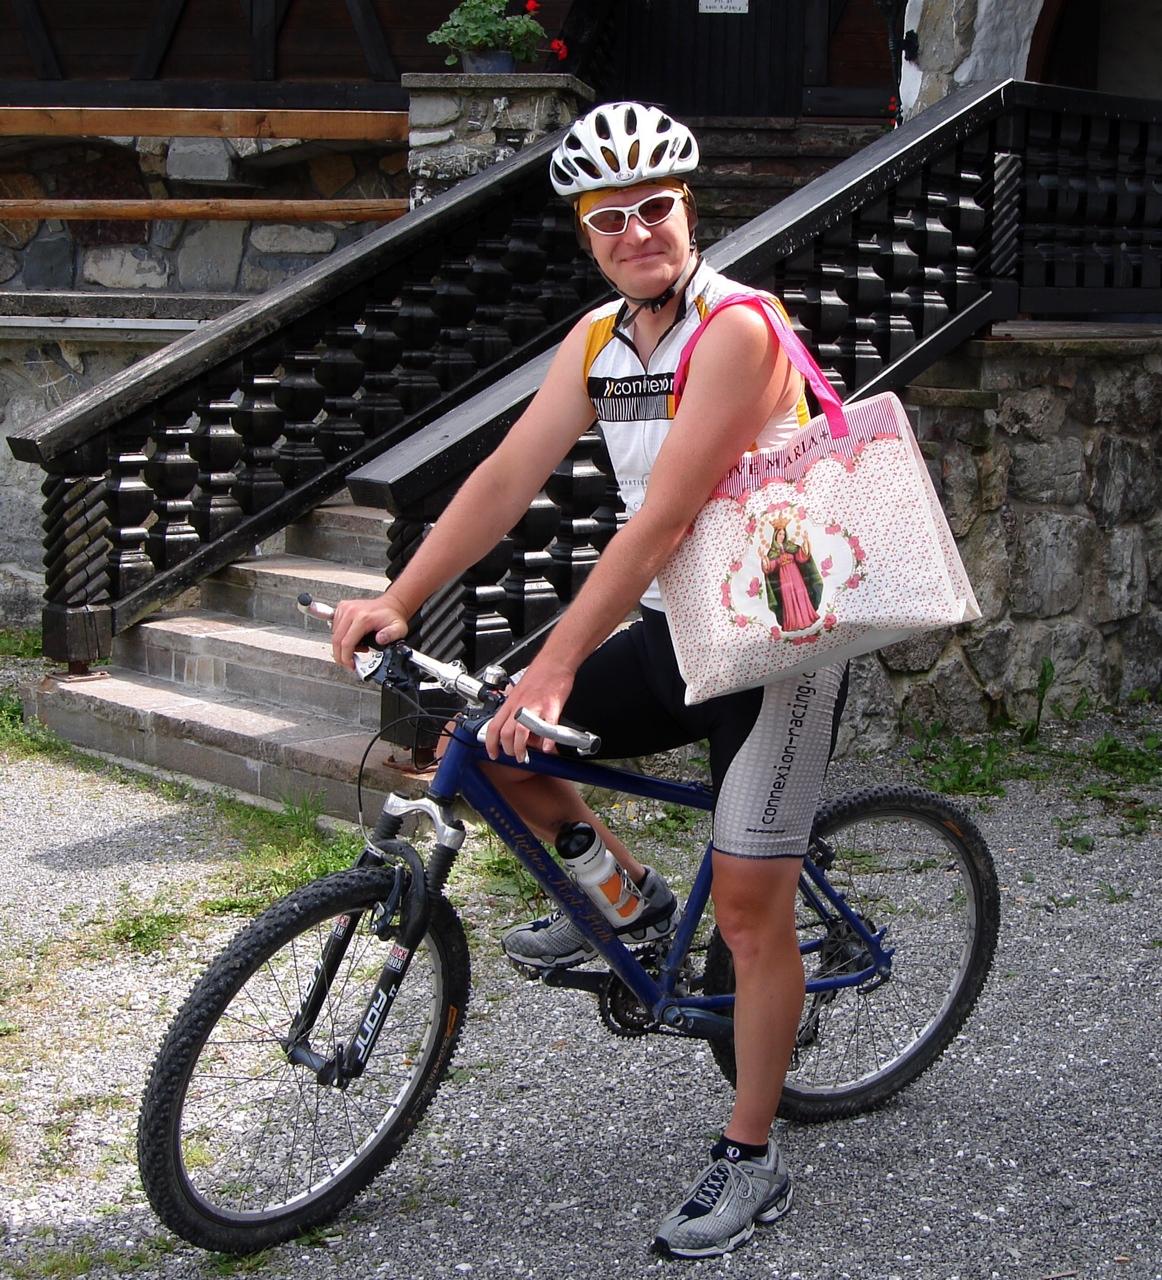 Mit dem Cityrad trainiert!